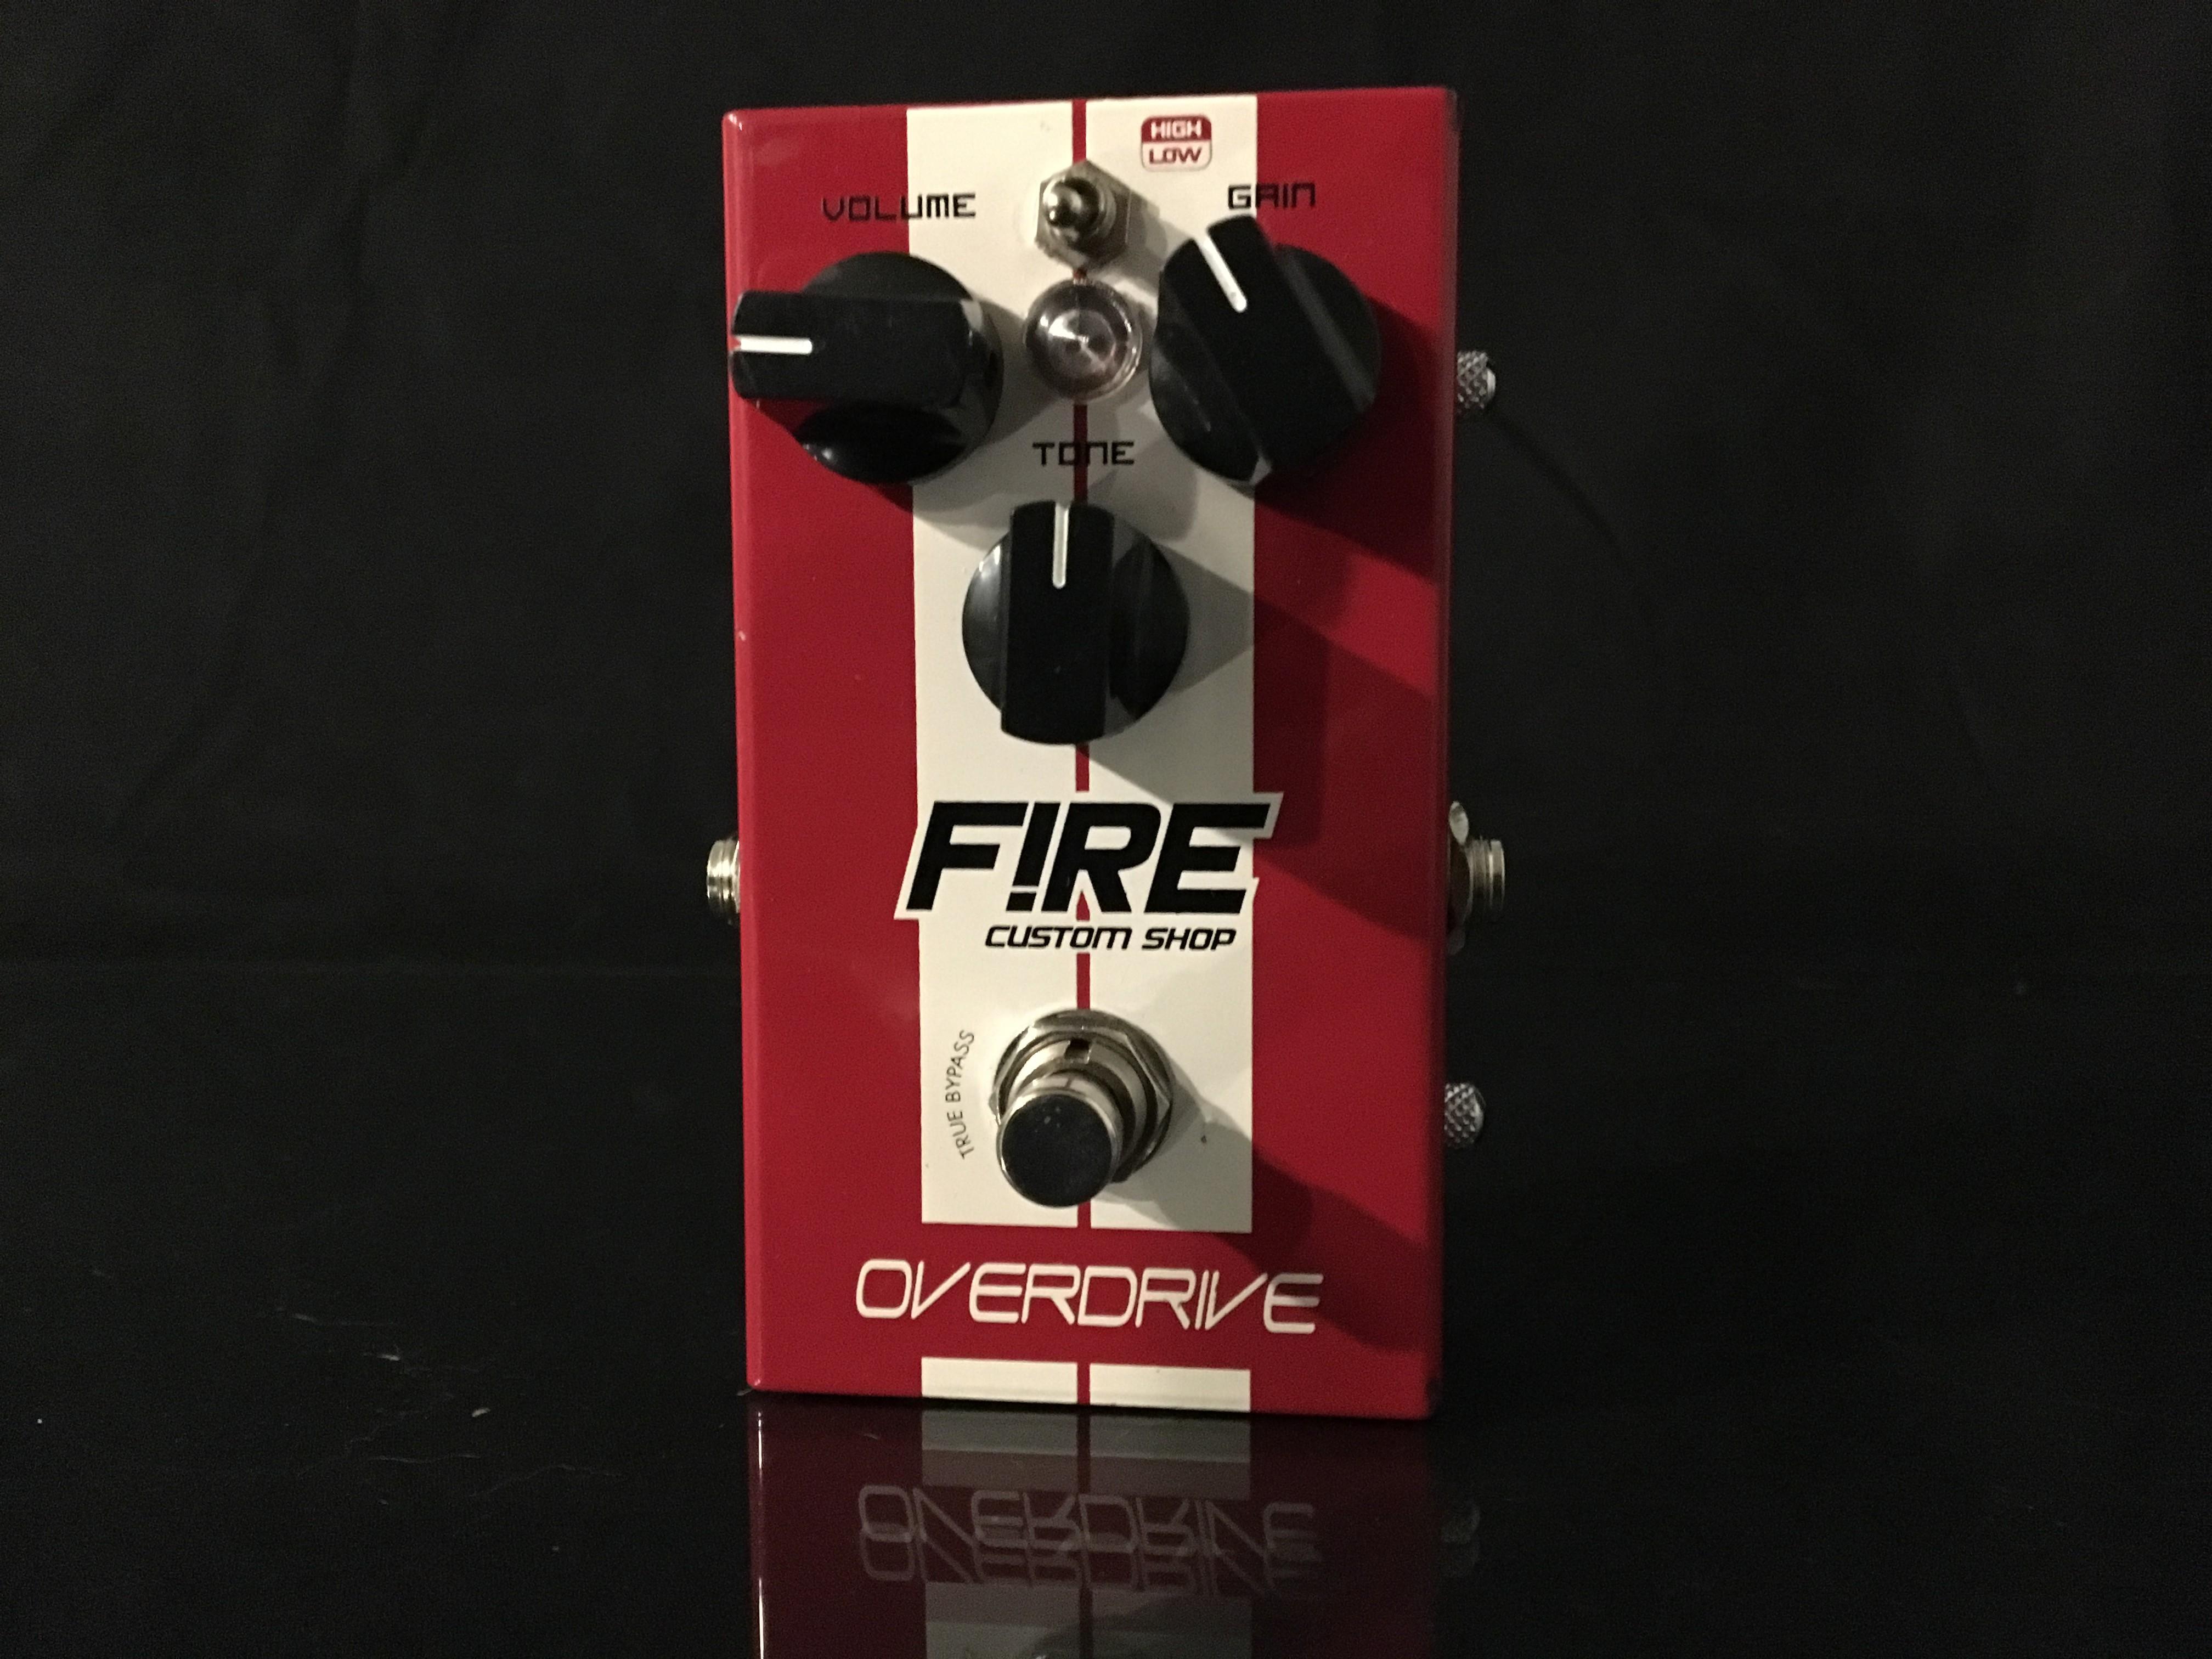 fire custom shop overdrive and kronos delay guitartonepro. Black Bedroom Furniture Sets. Home Design Ideas